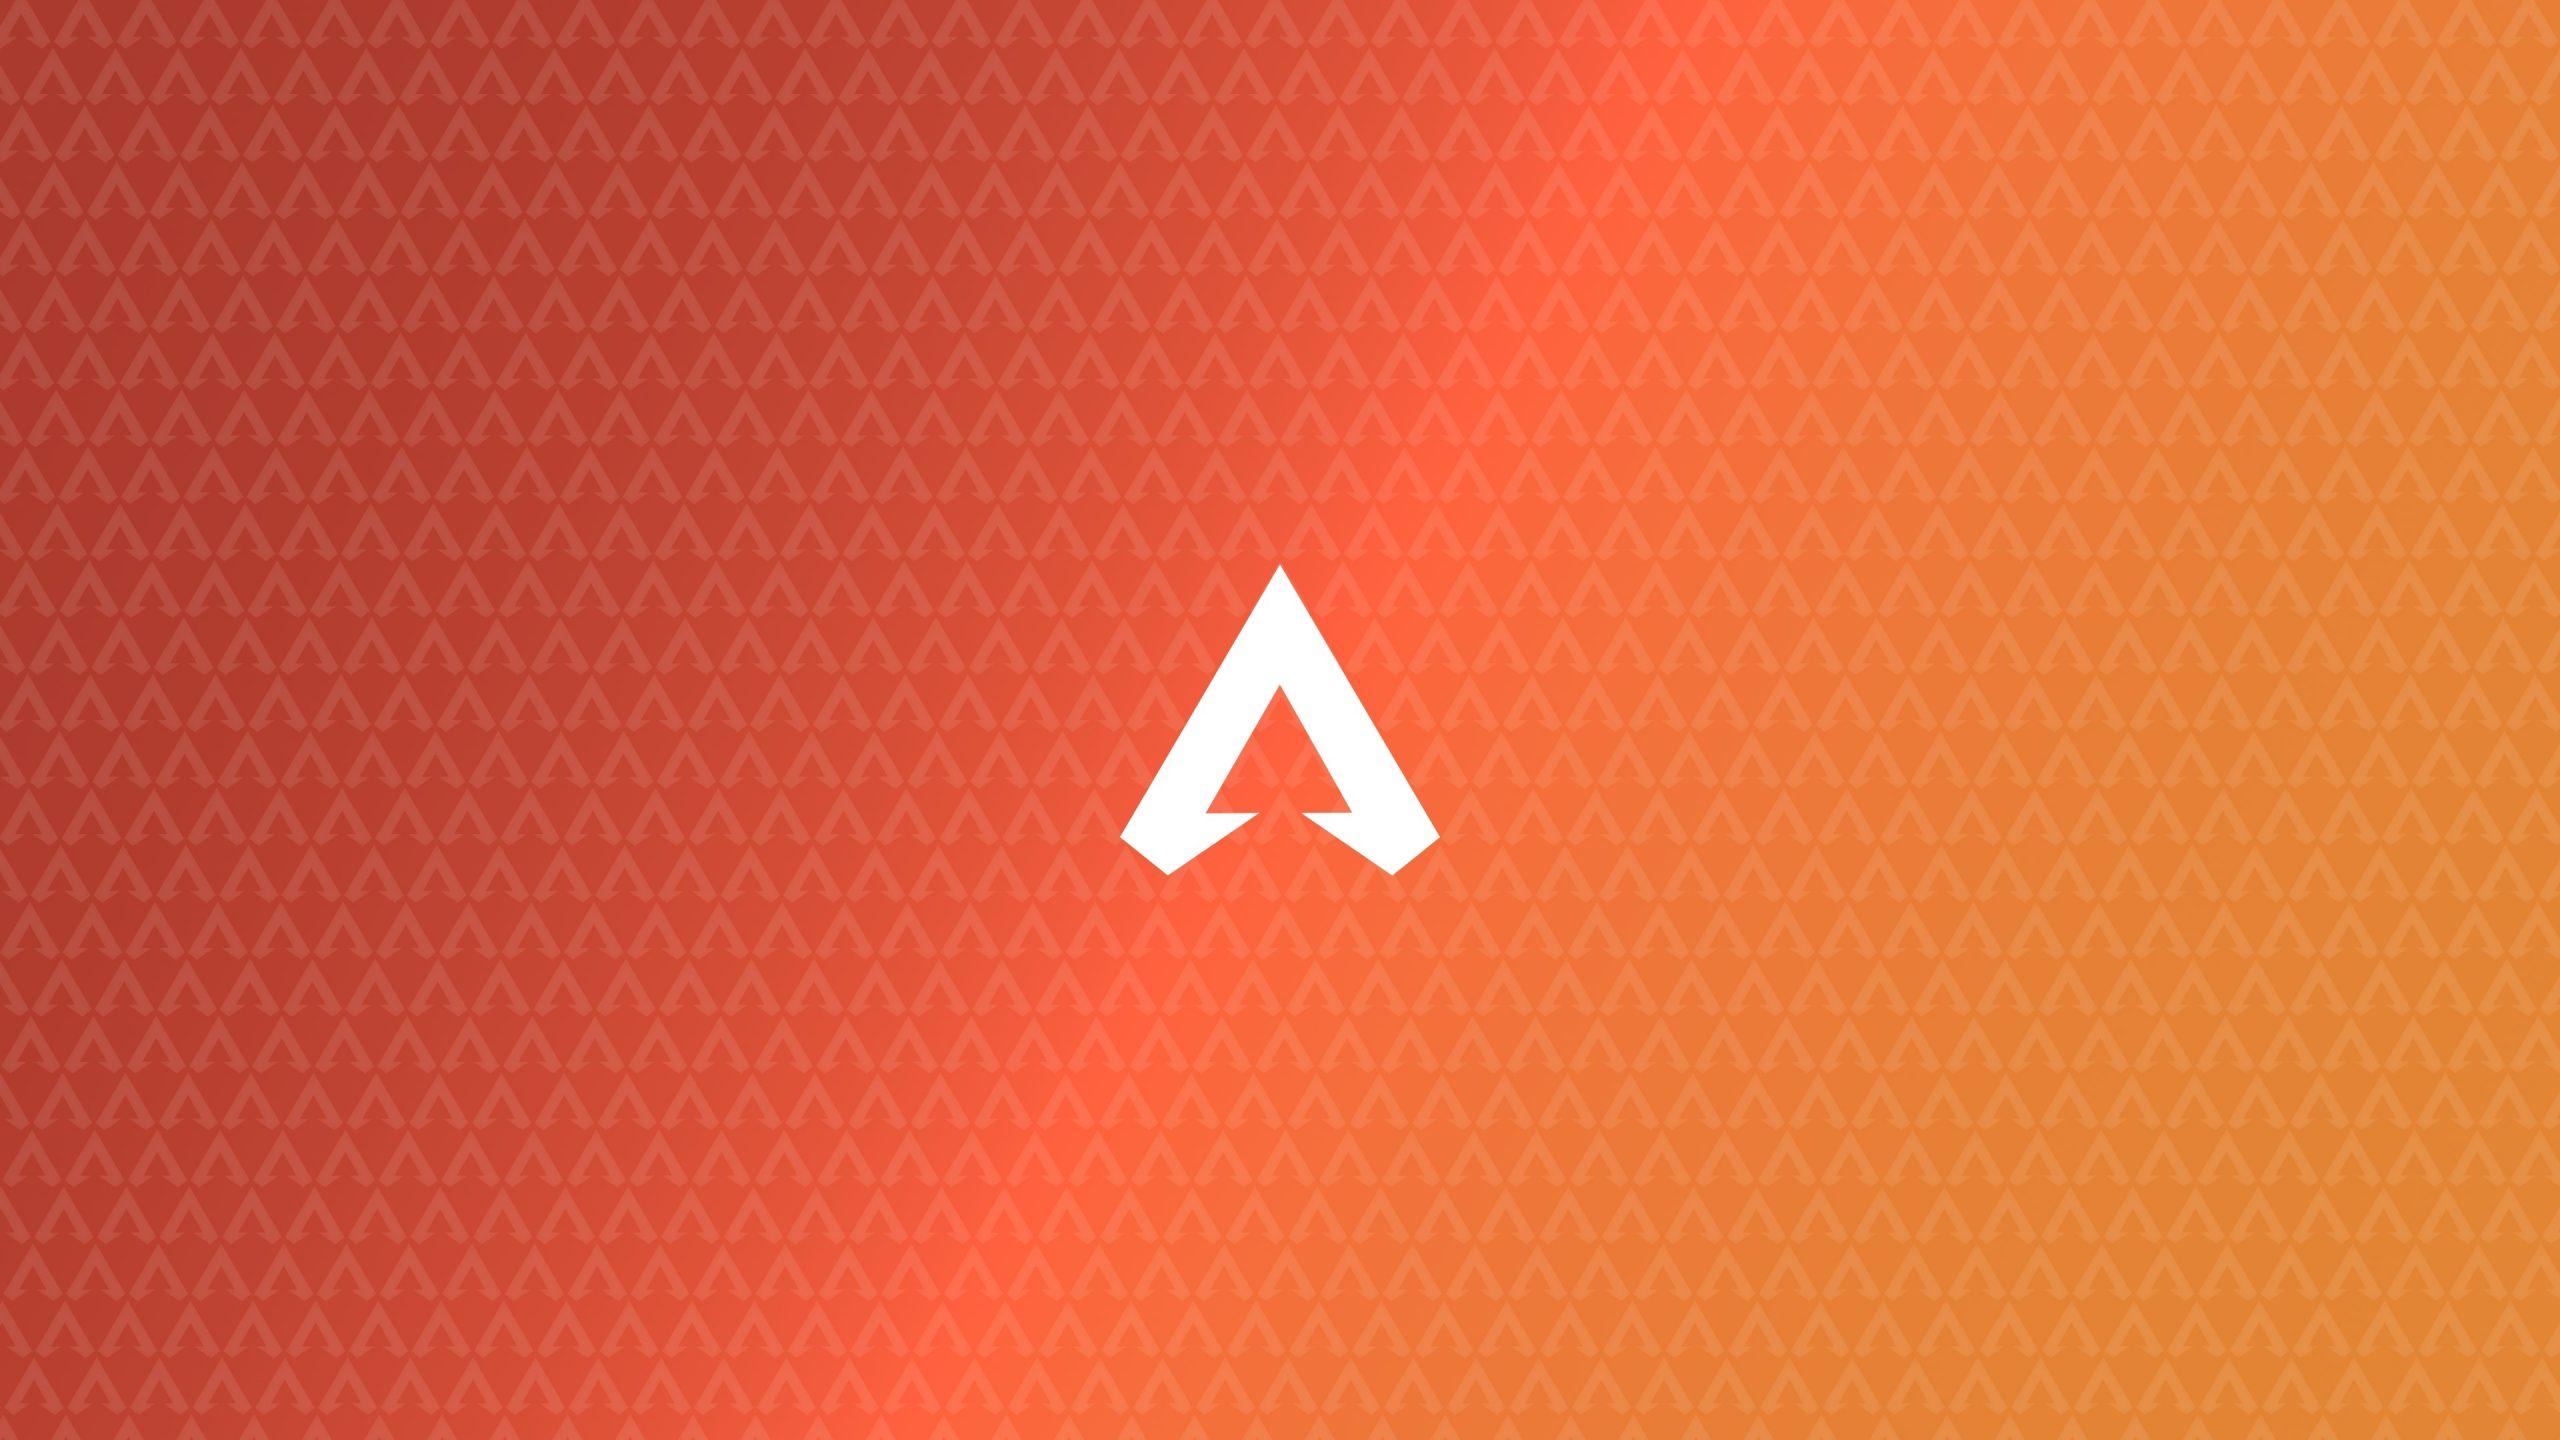 Apex Desktop HD 4K Wallpaper scaled